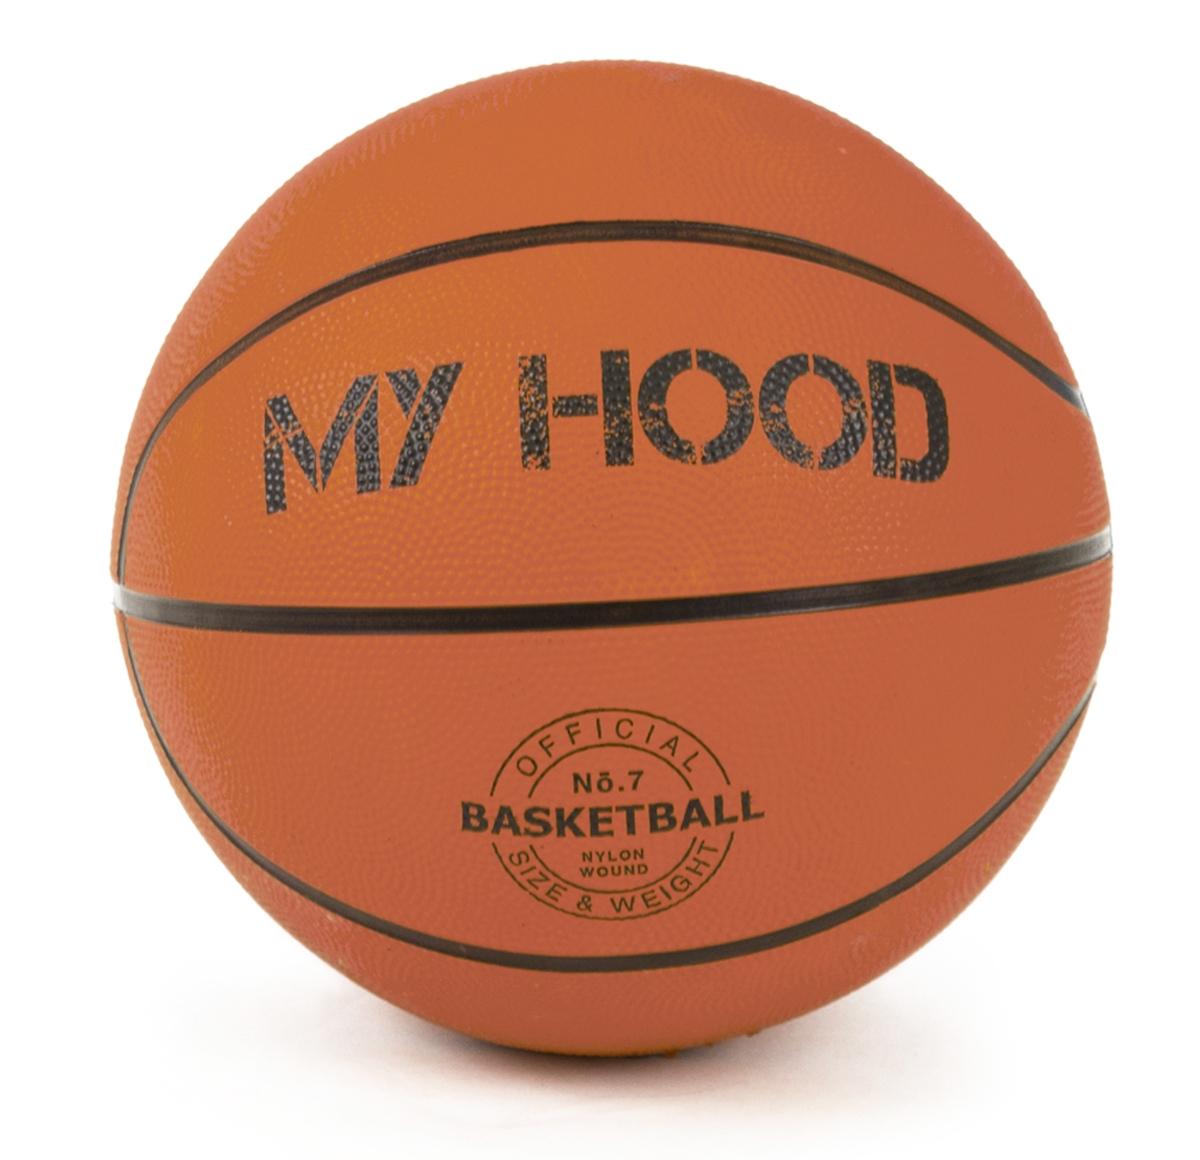 My Hood - Basketball Size 7 (304009)